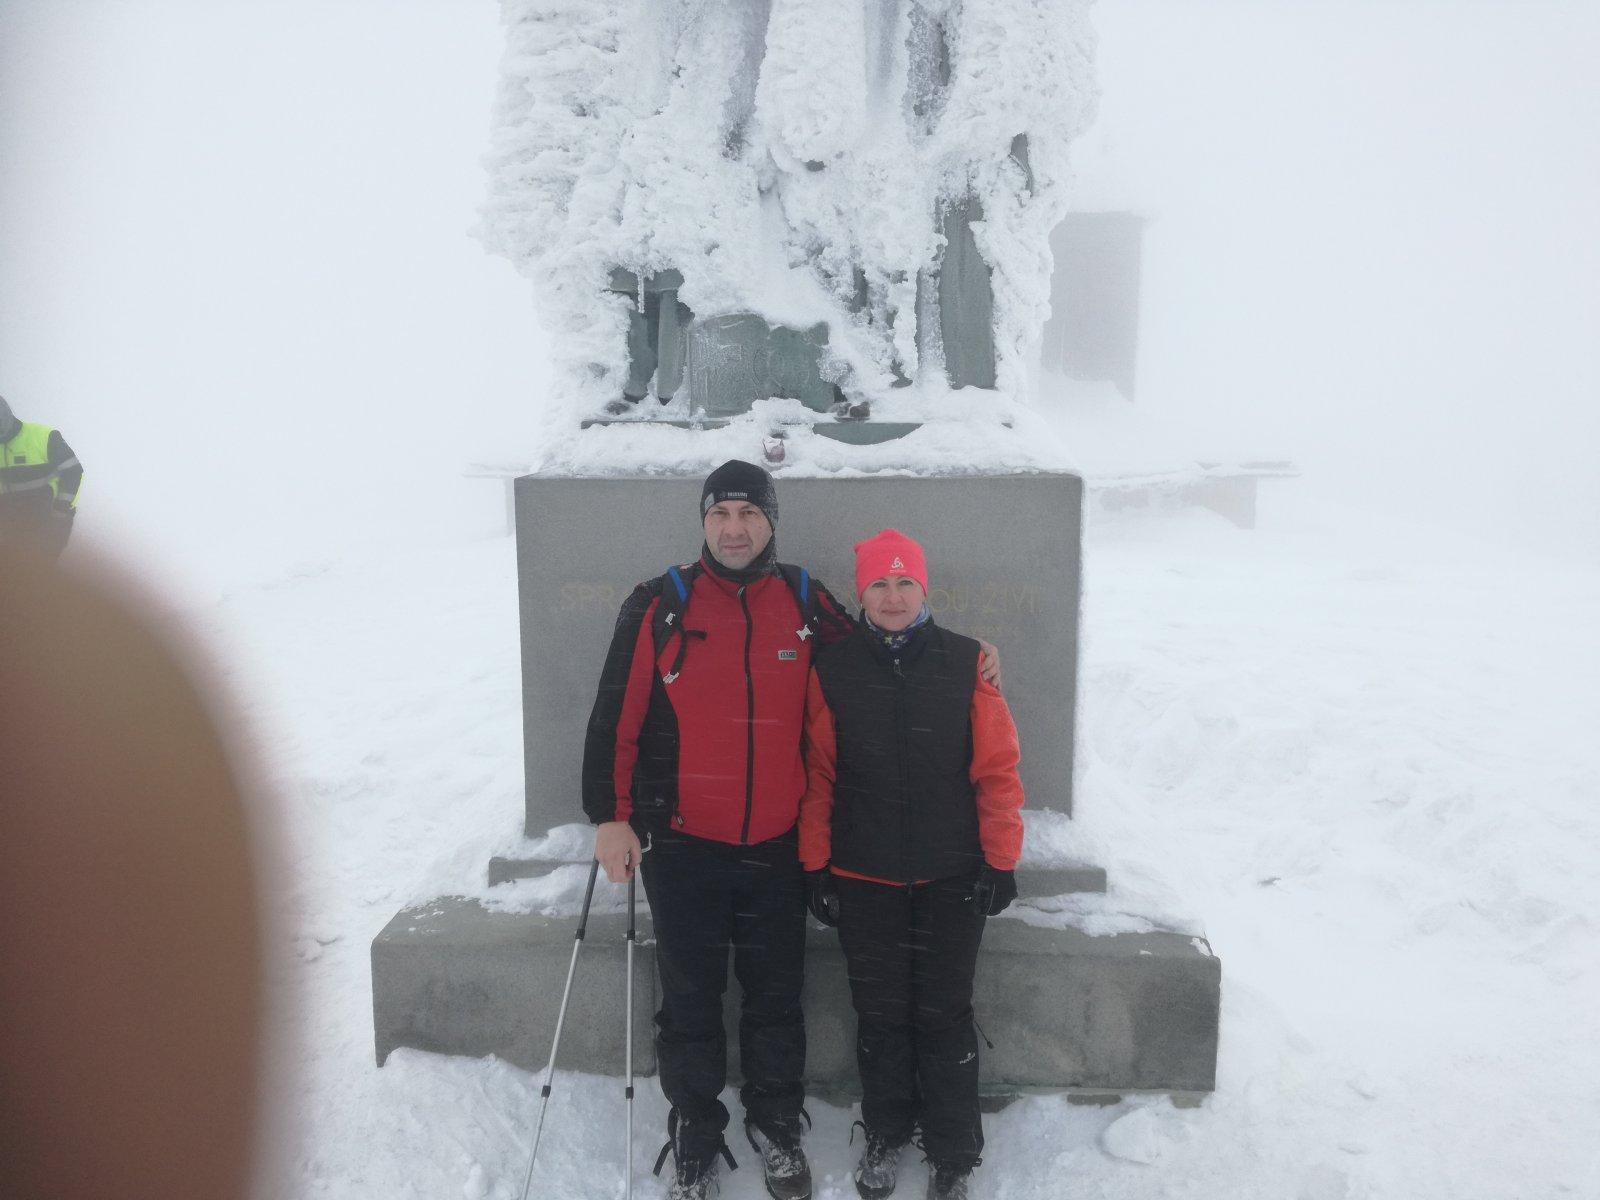 Jiří P na vrcholu Radhošť (26.1.2019 13:49)